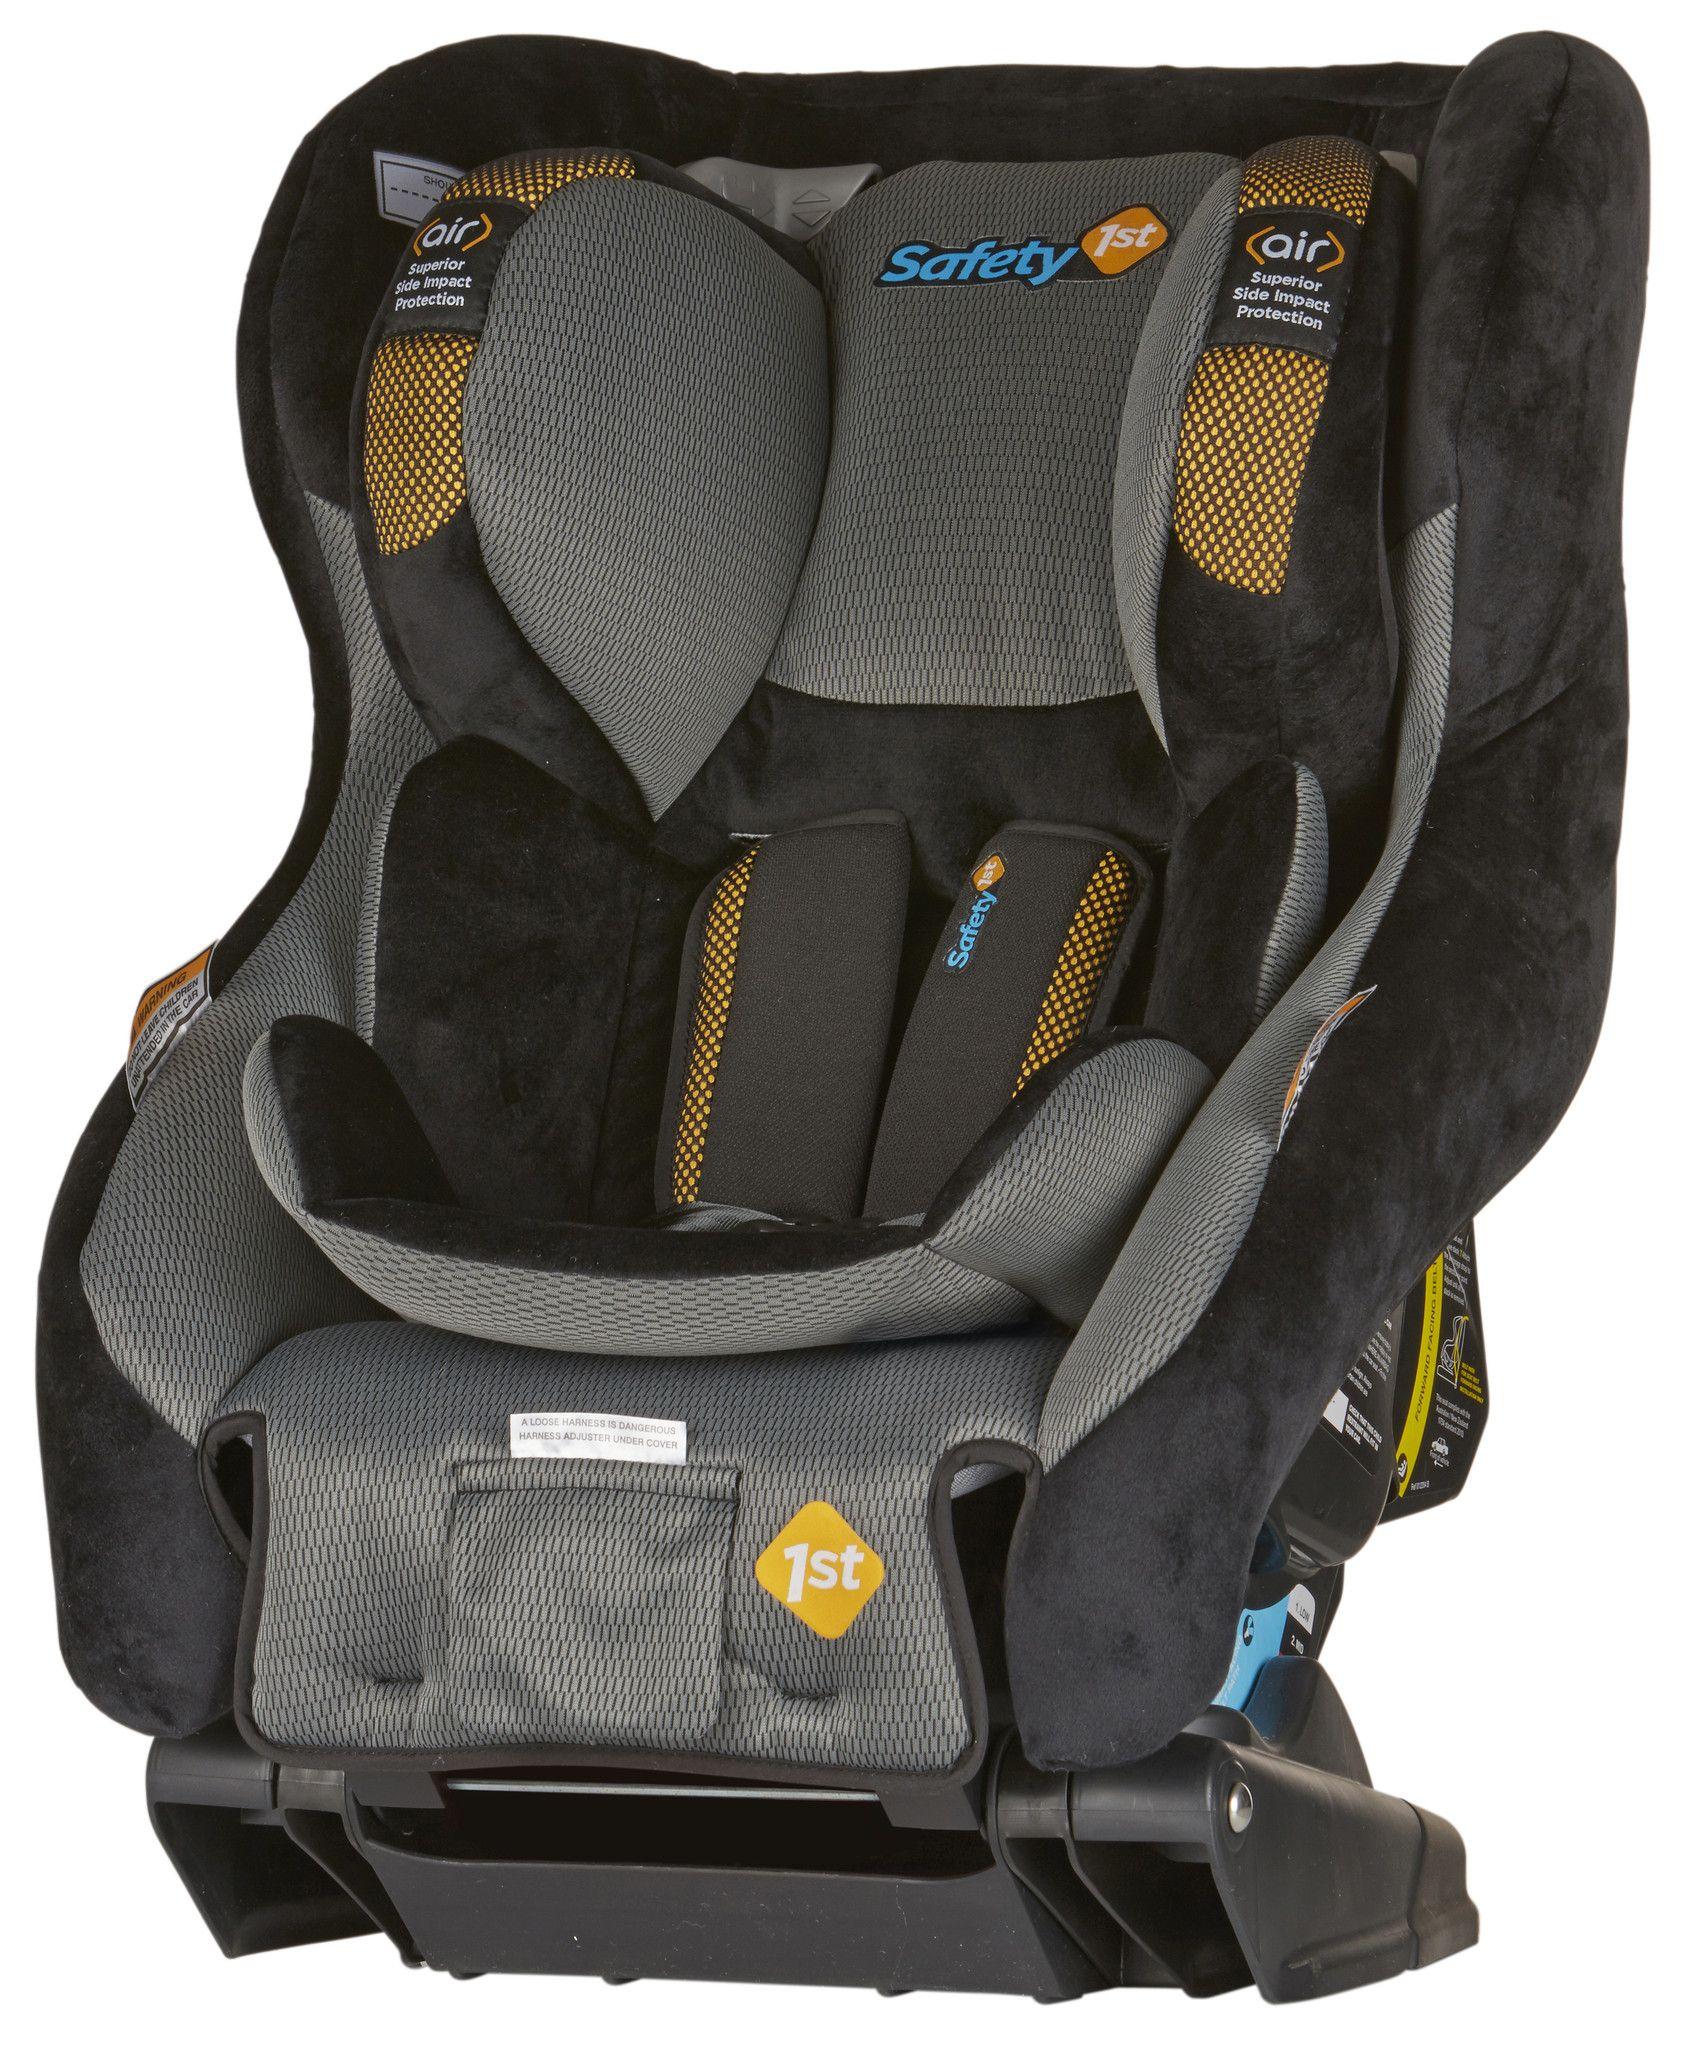 Safety 1st Sentinel II (suitable newborn 4 years) Baby